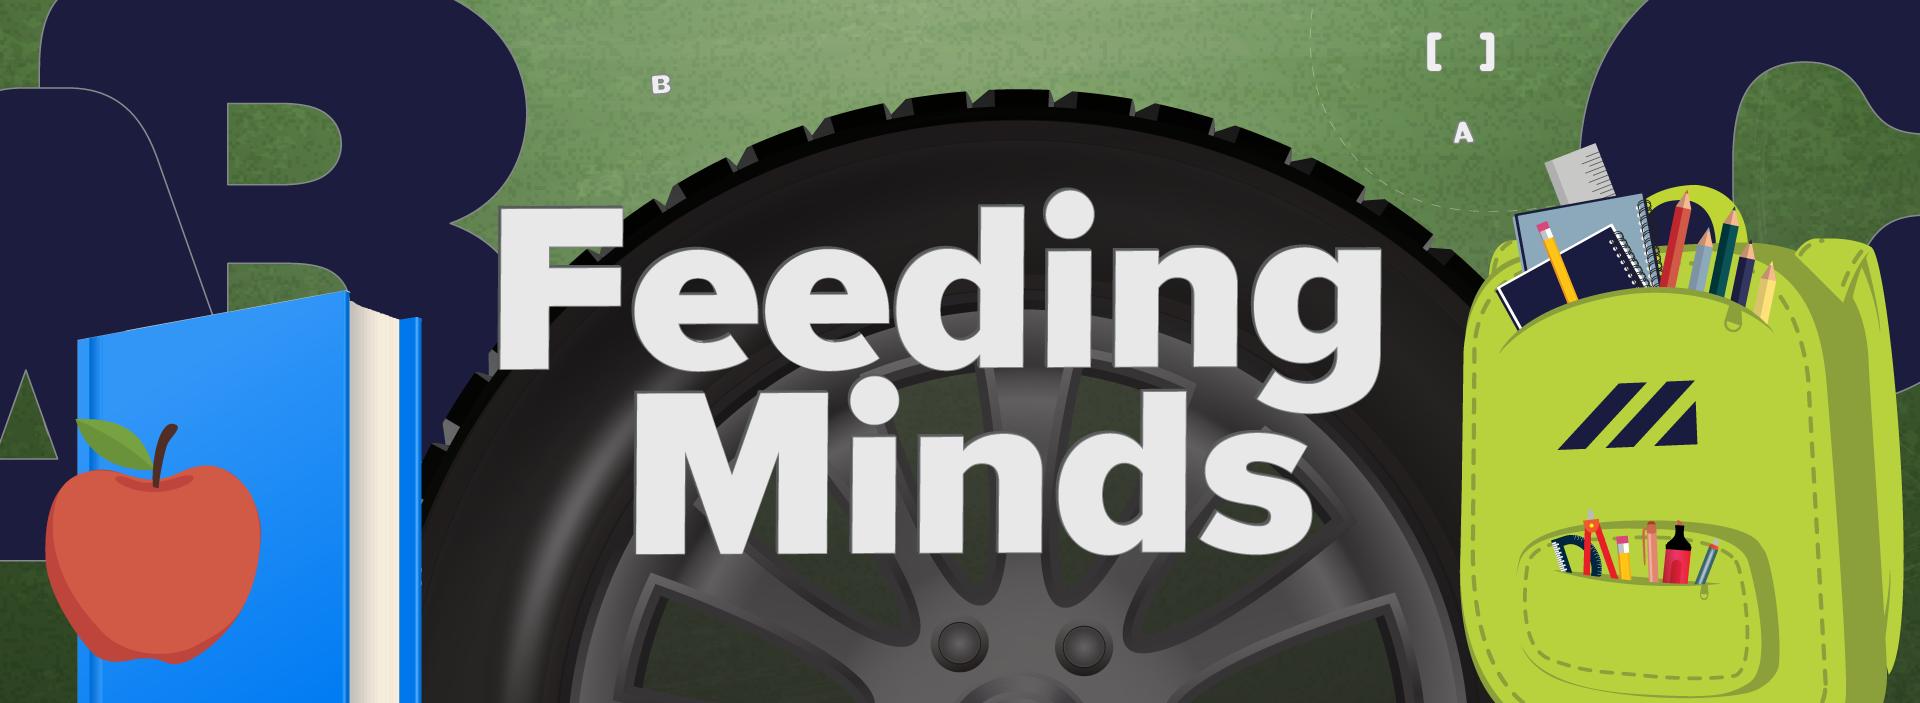 Feeding Minds banner